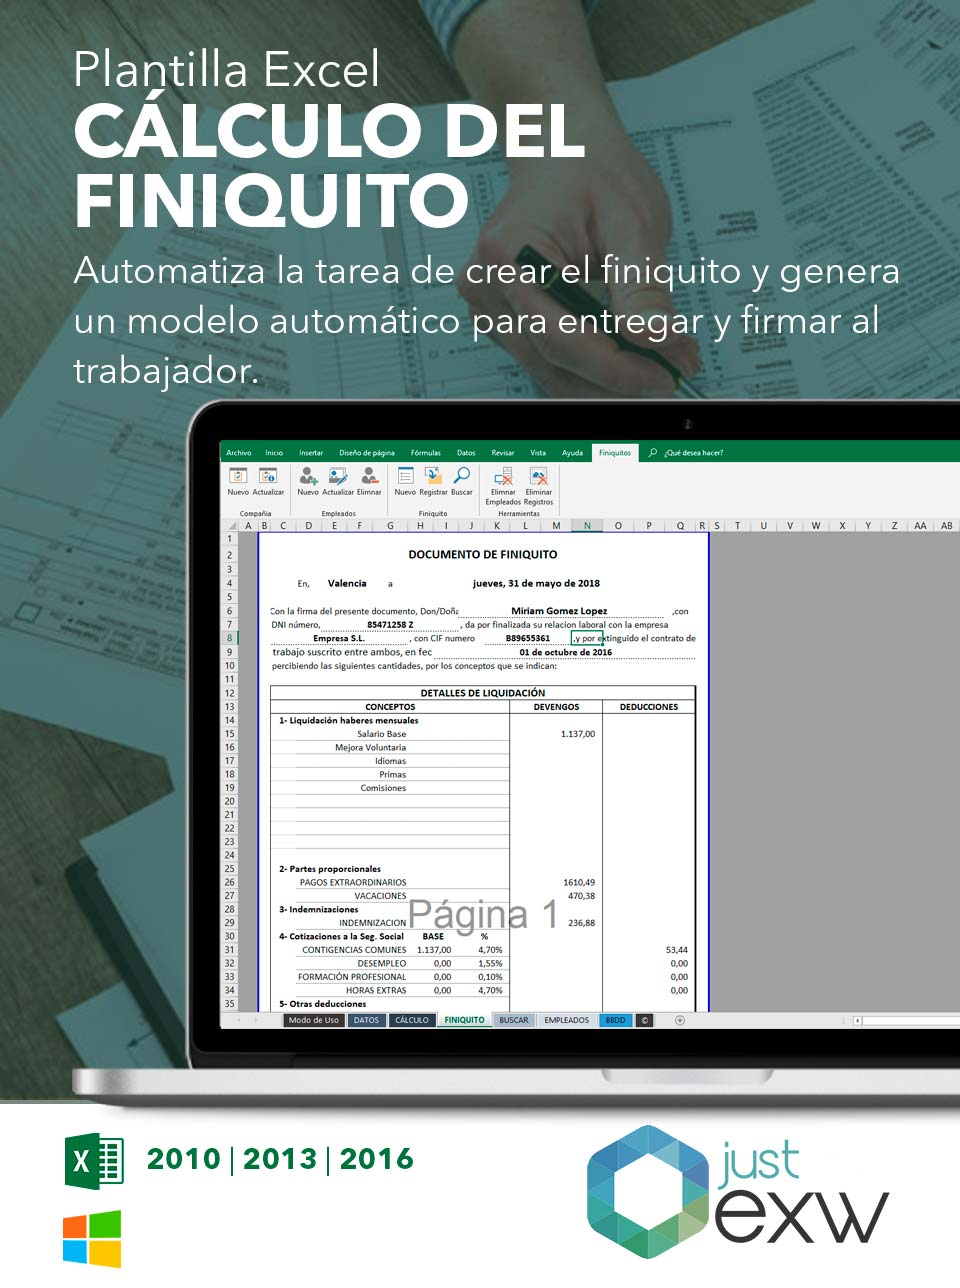 Plantilla de Excel calculadora de finiquito